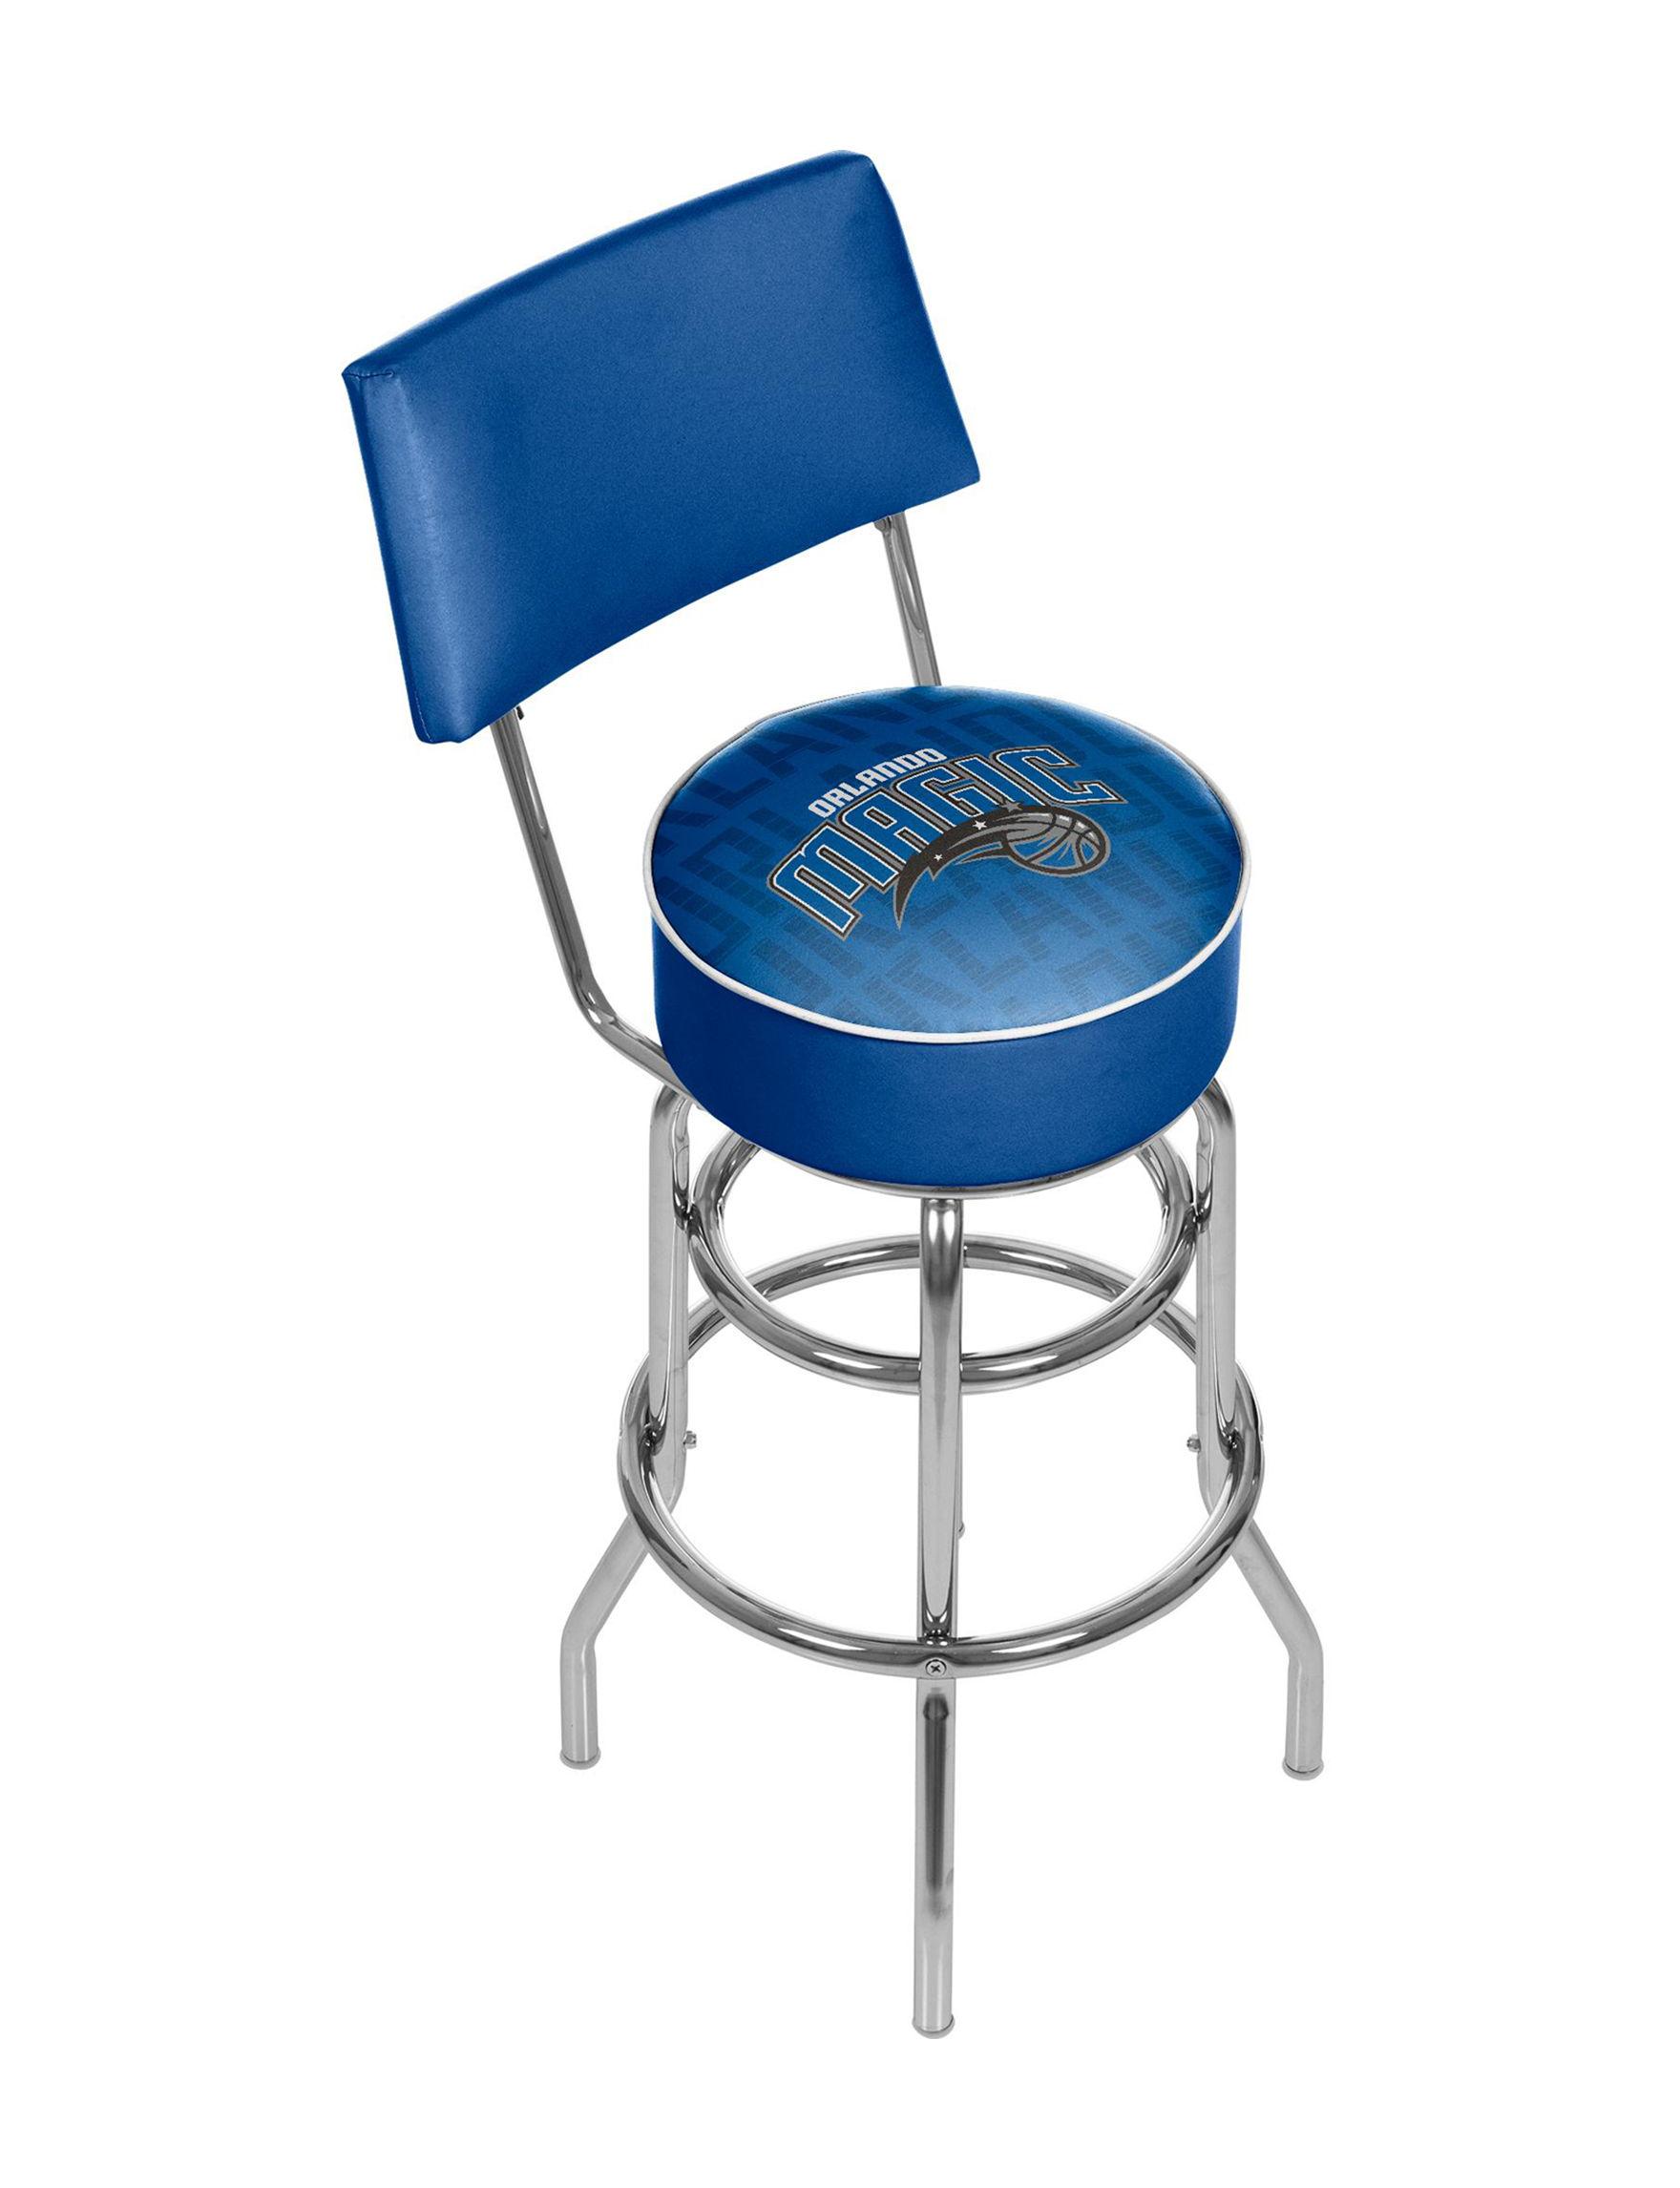 Trademark Global Blue / Grey Bar & Kitchen Stools Game Room Kitchen & Dining Furniture